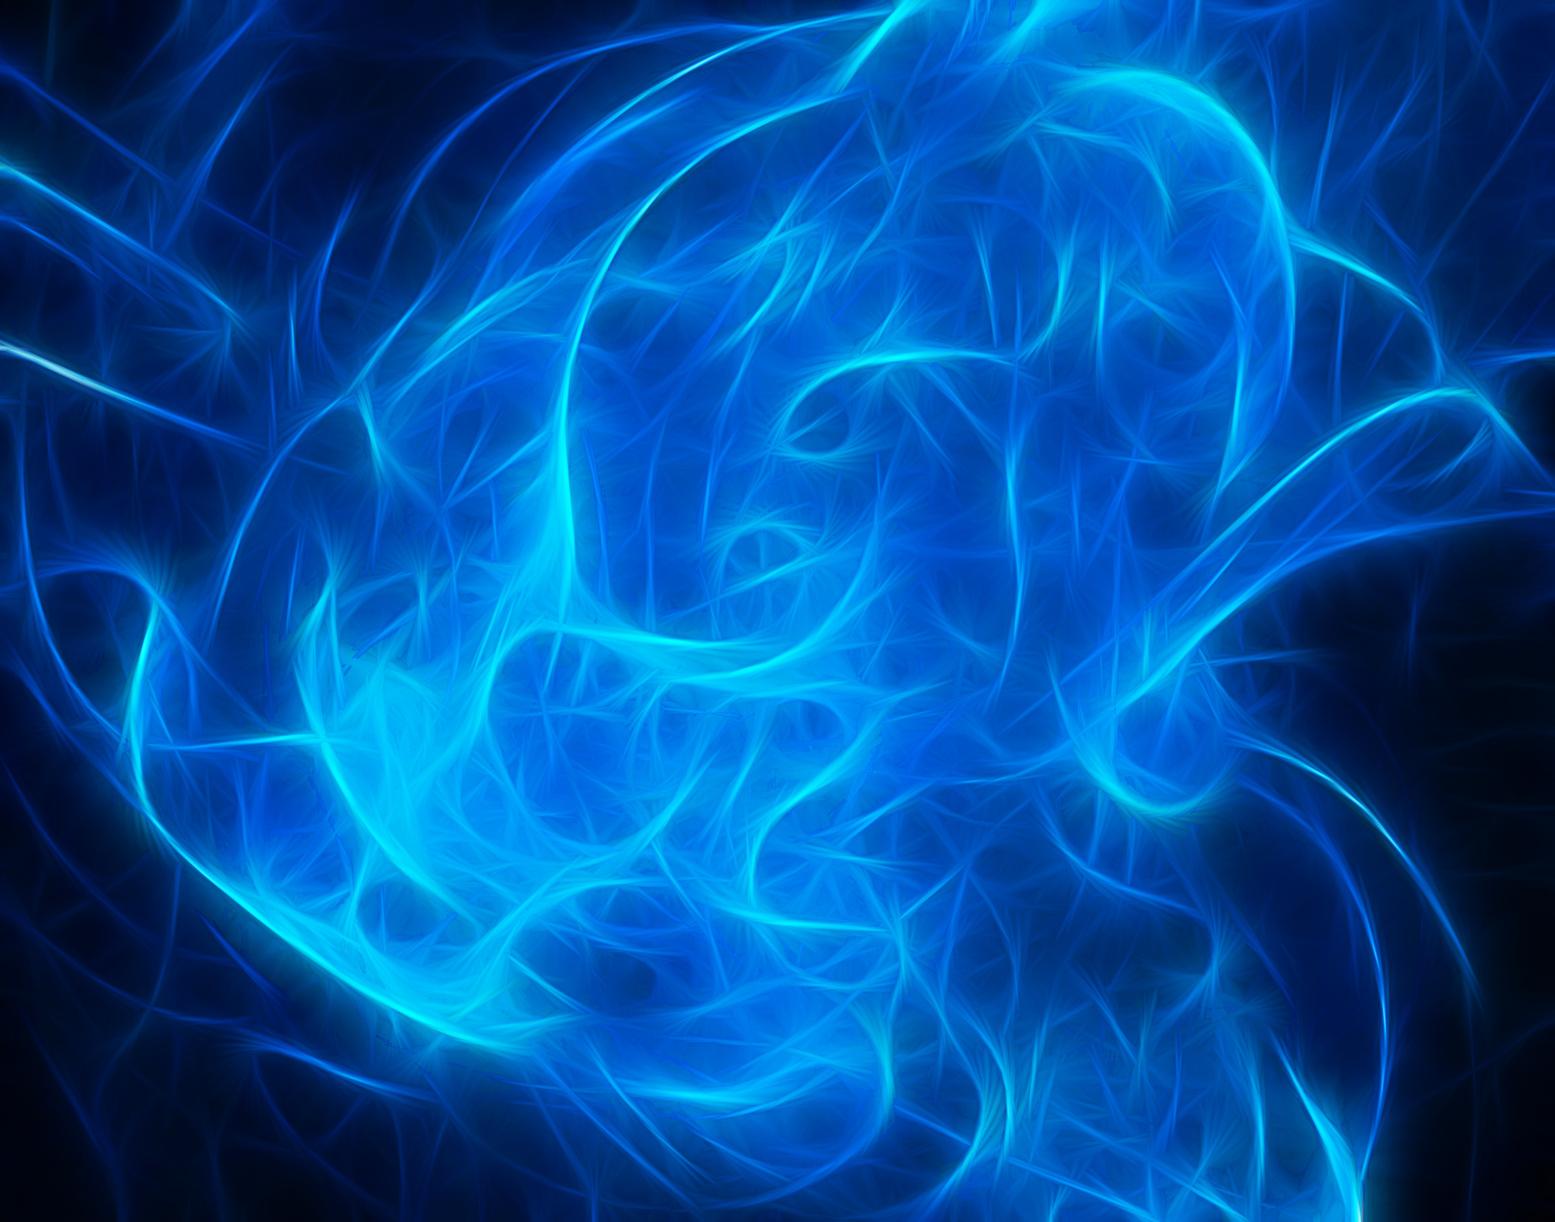 Blue Smoke 15919893 by StockProject1 on DeviantArt